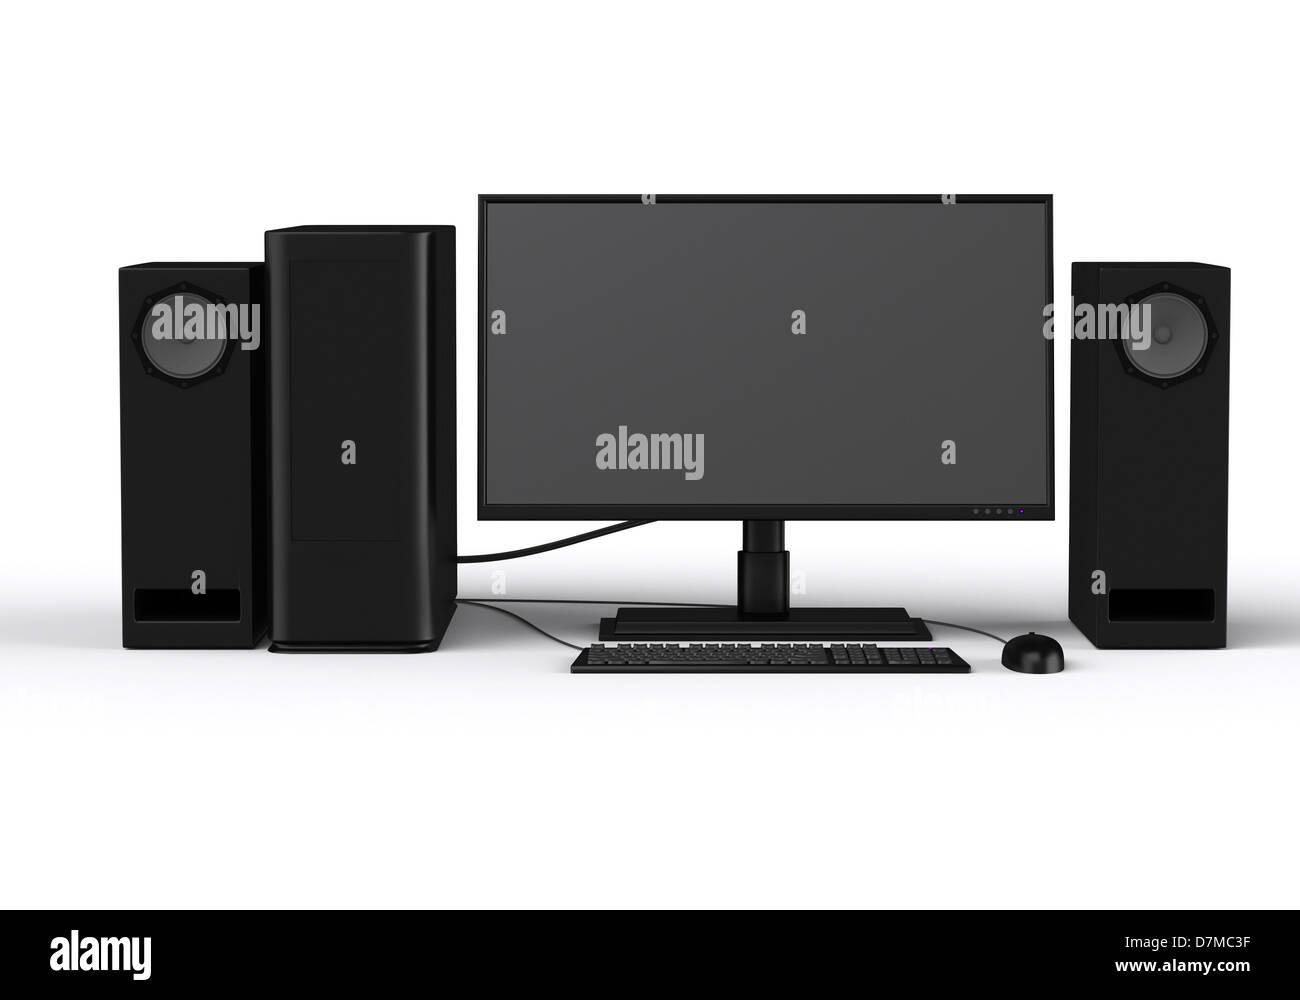 Personal computer, artwork - Stock Image